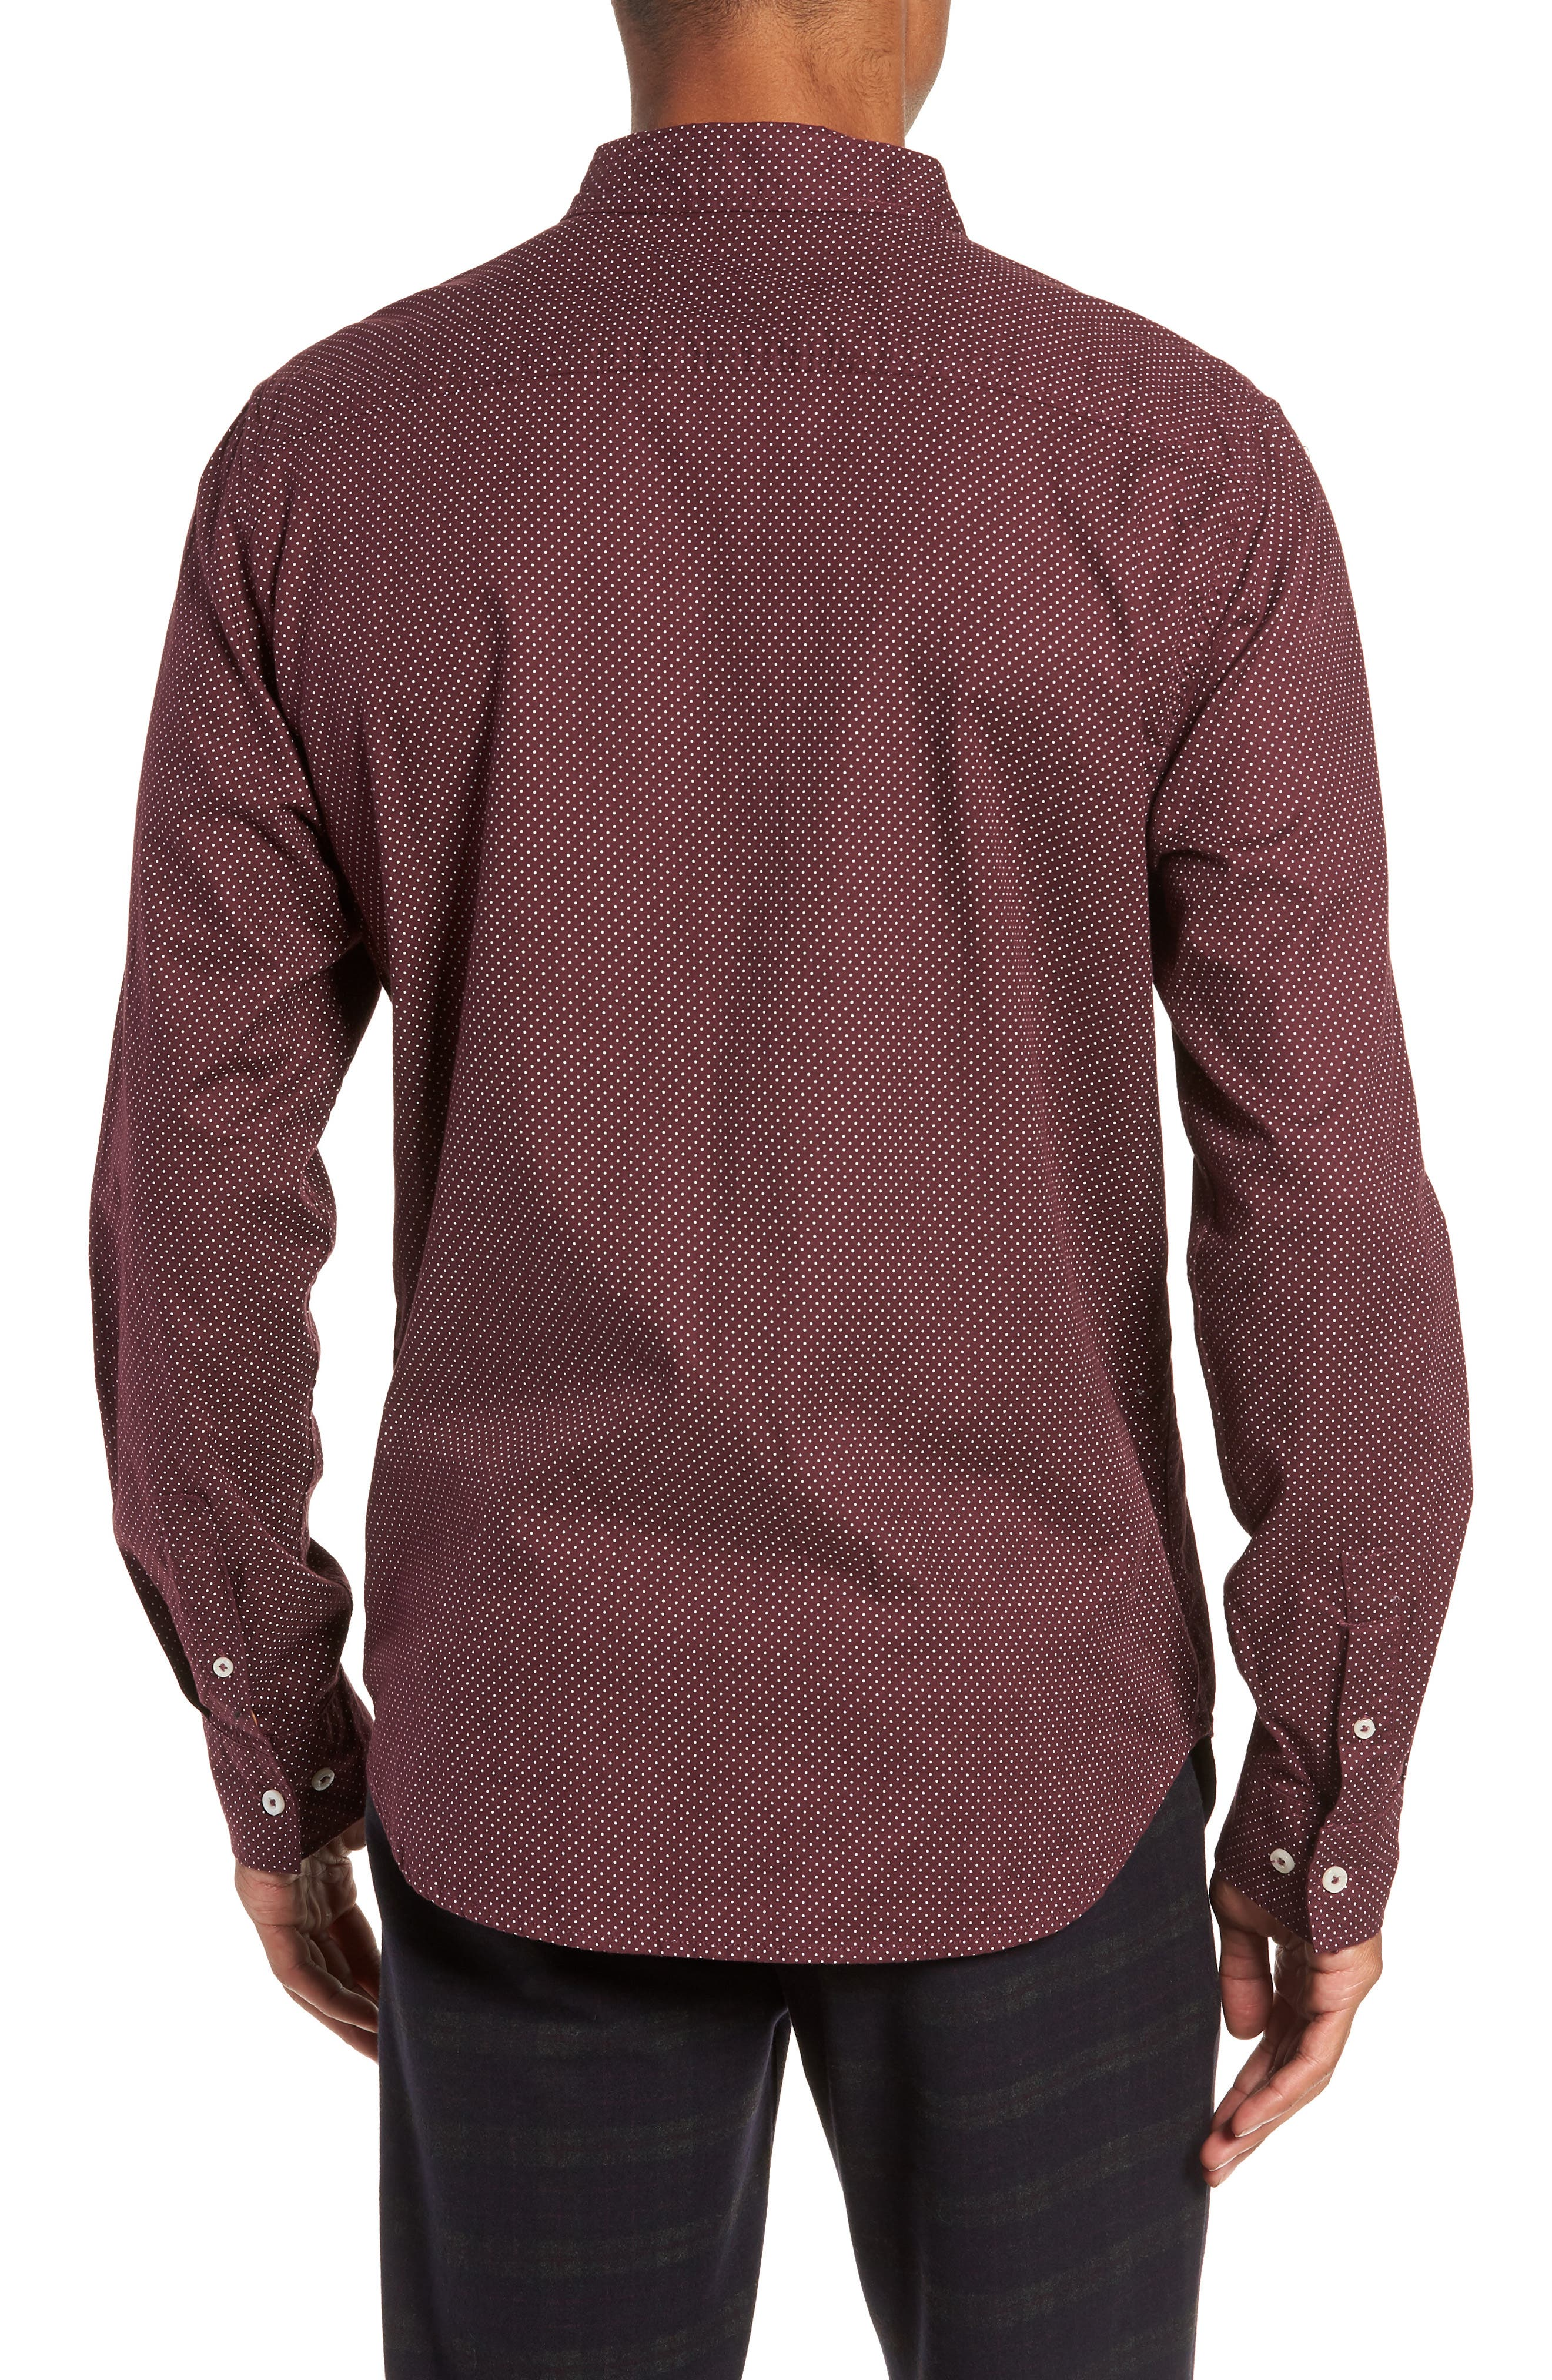 Earnest Regular Fit Dotted Sport Shirt,                             Alternate thumbnail 3, color,                             BURGUNDY